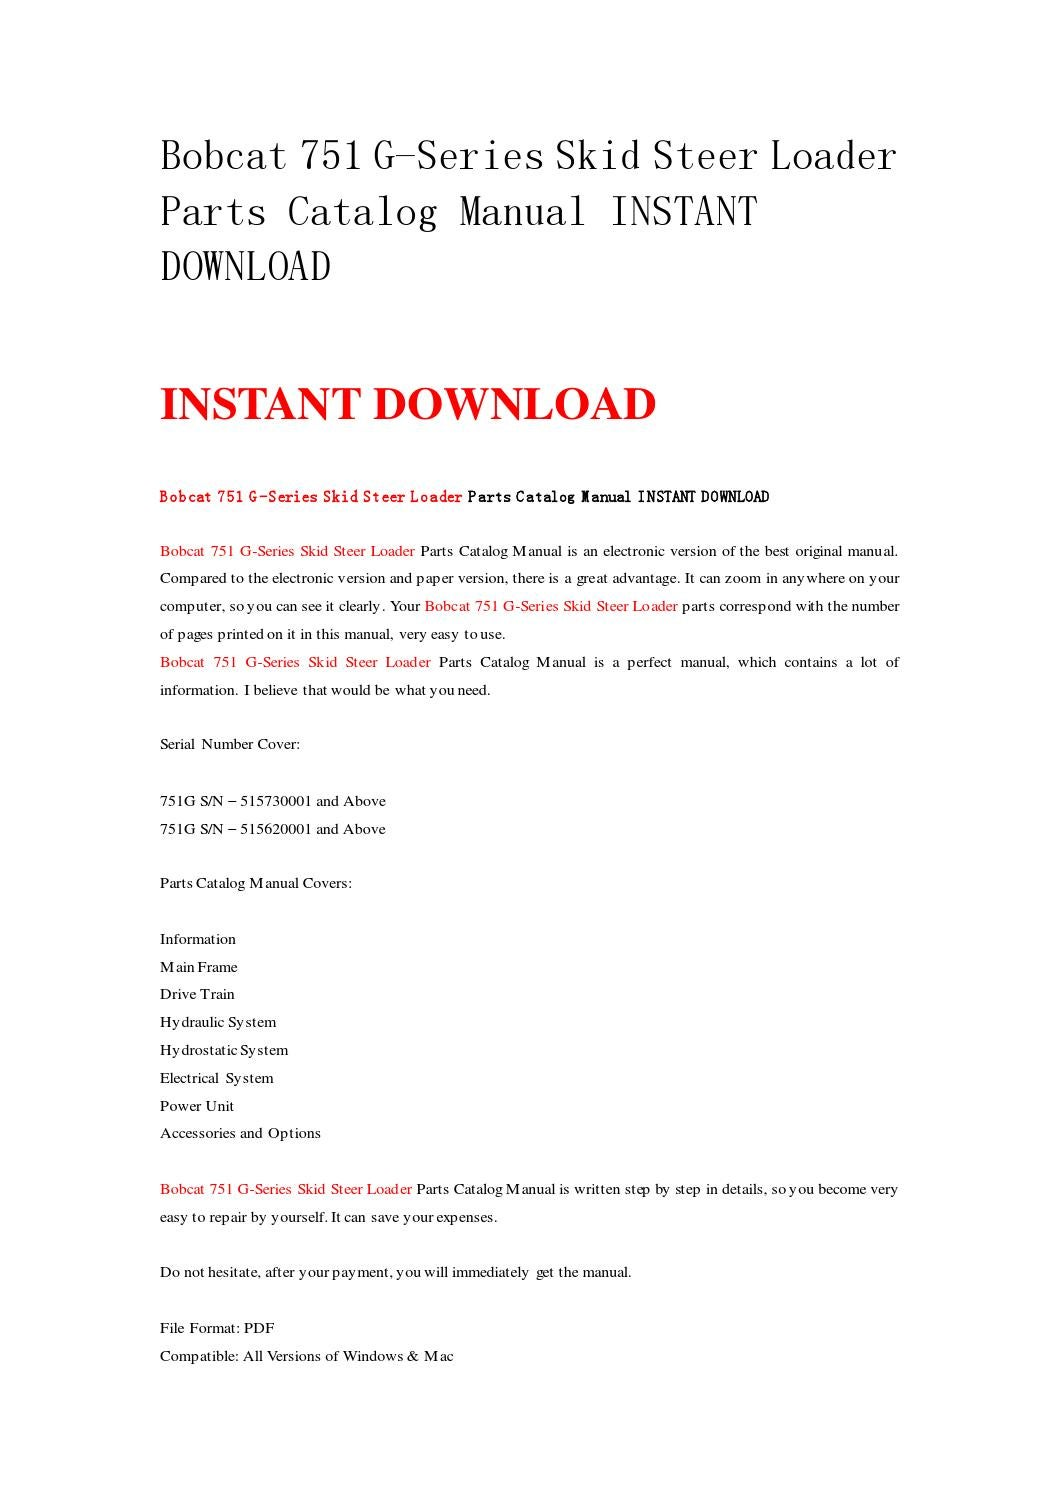 hight resolution of bobcat 751 g series skid steer loader parts catalog manual instant download by nwqrez issuu